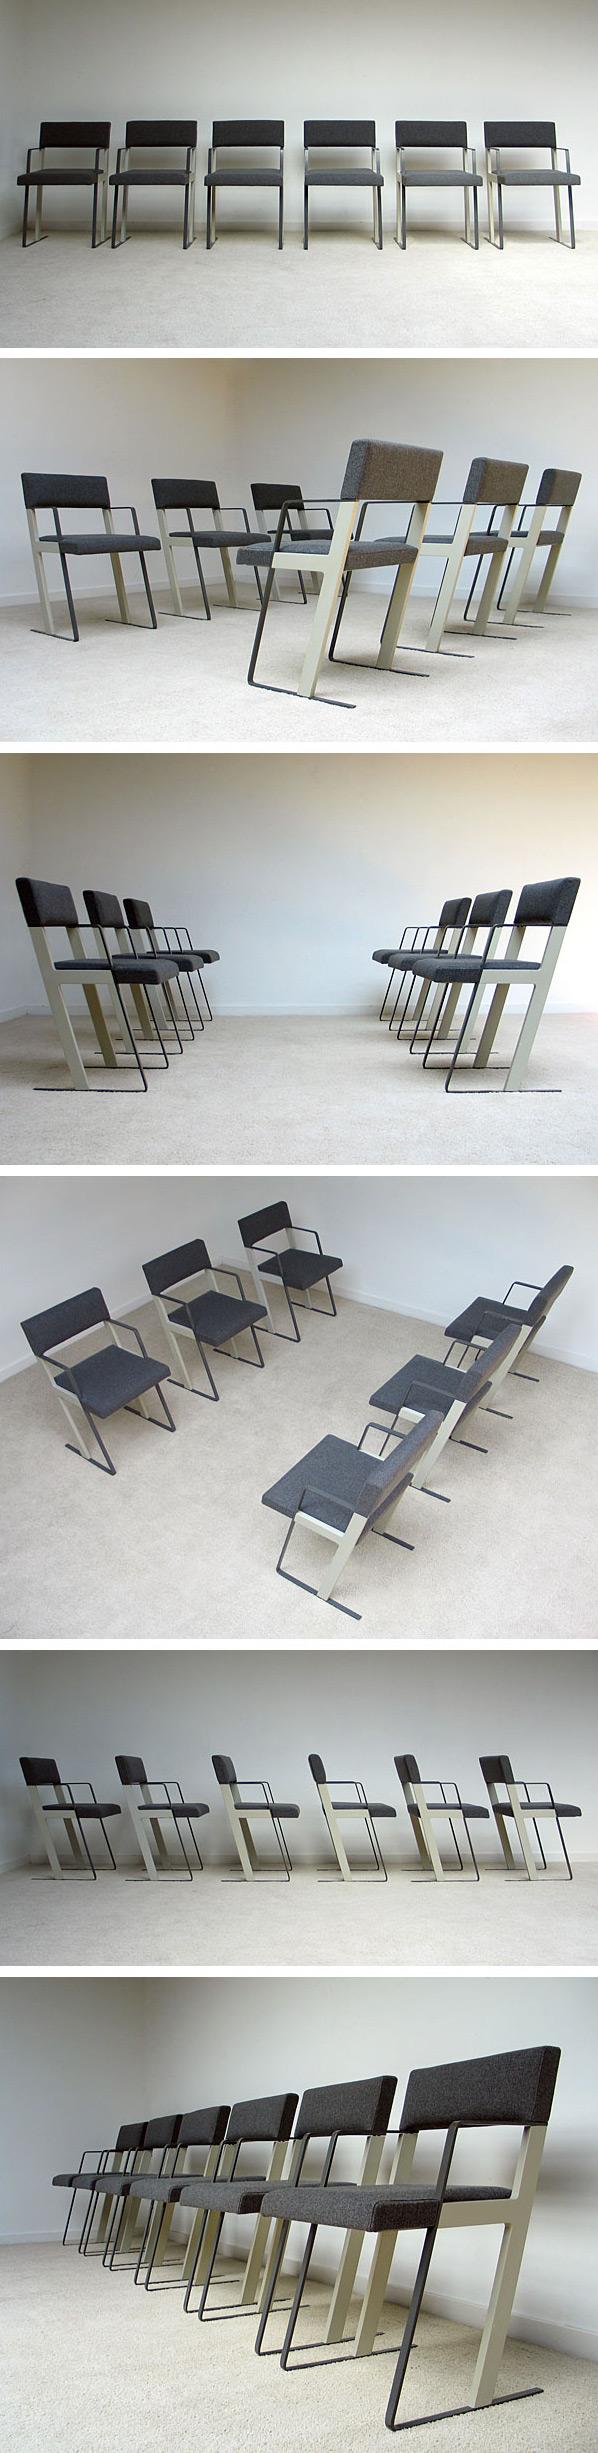 Dick Spierenburg 6 DC chairs for Castelijn 1978 Large